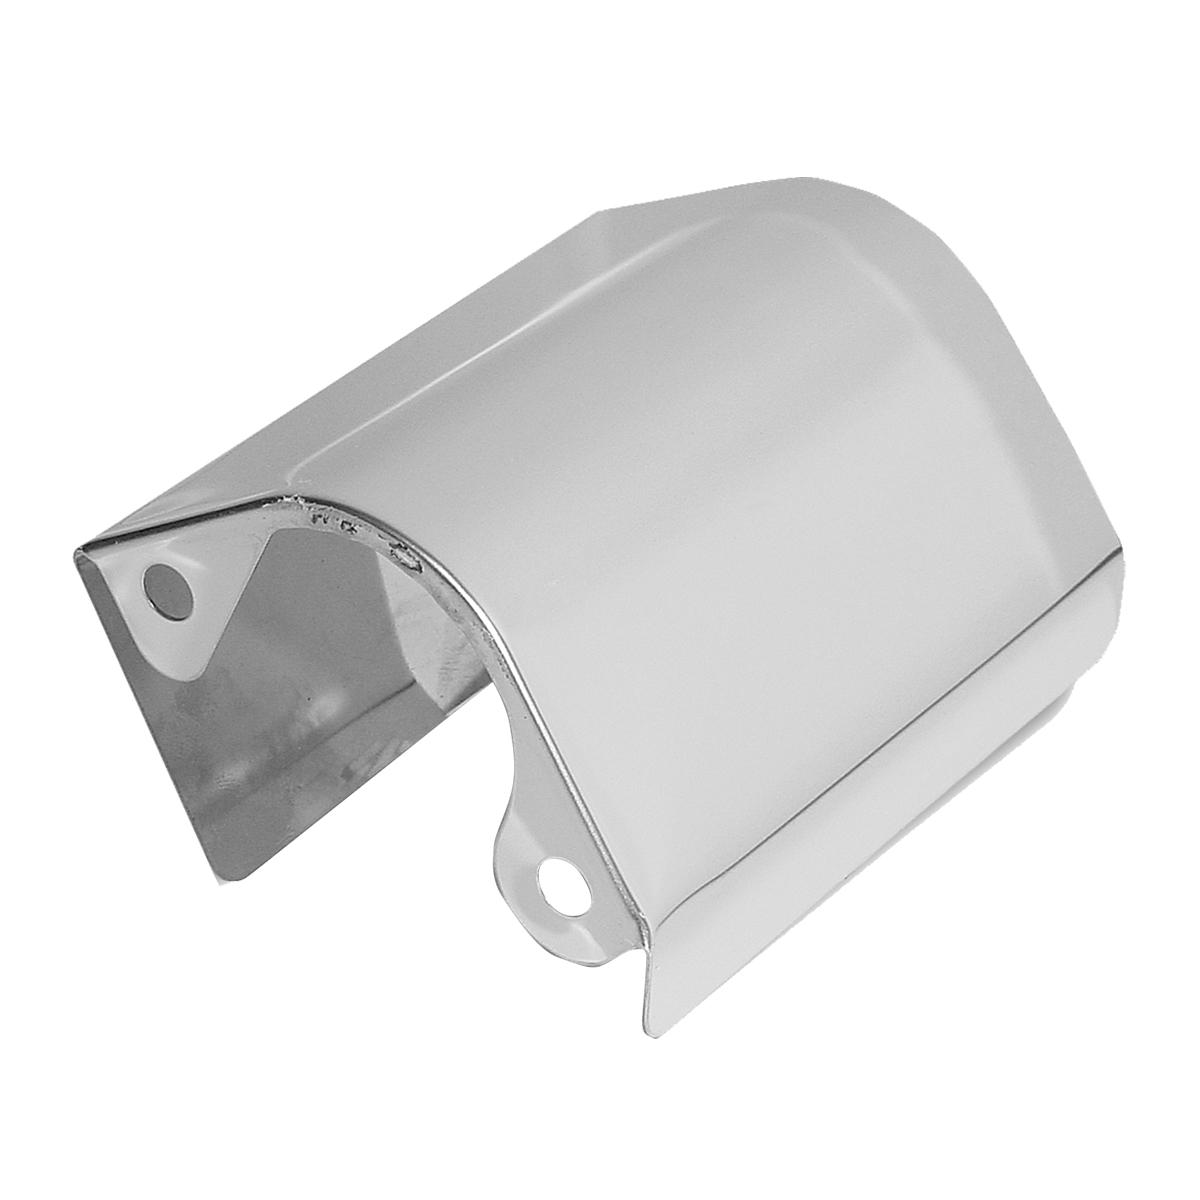 68710 Stainless Steel Hand Brake Line Cover for Freightliner